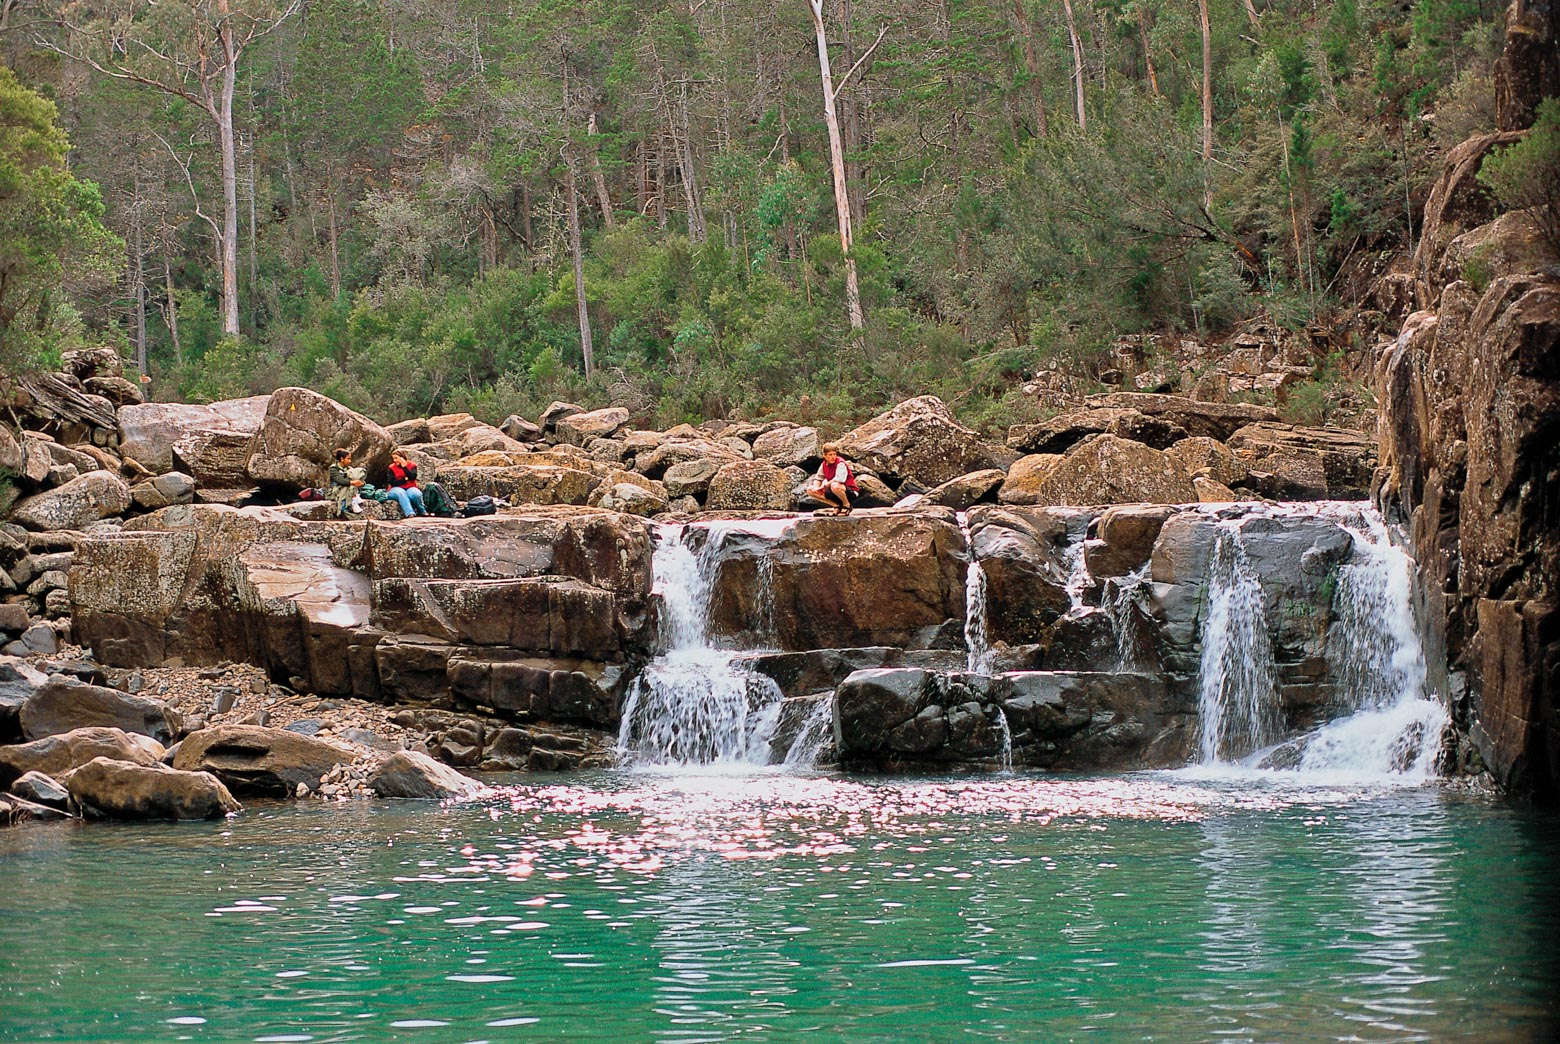 Apsley River Waterhole - Tasmania itinerary (7 days)